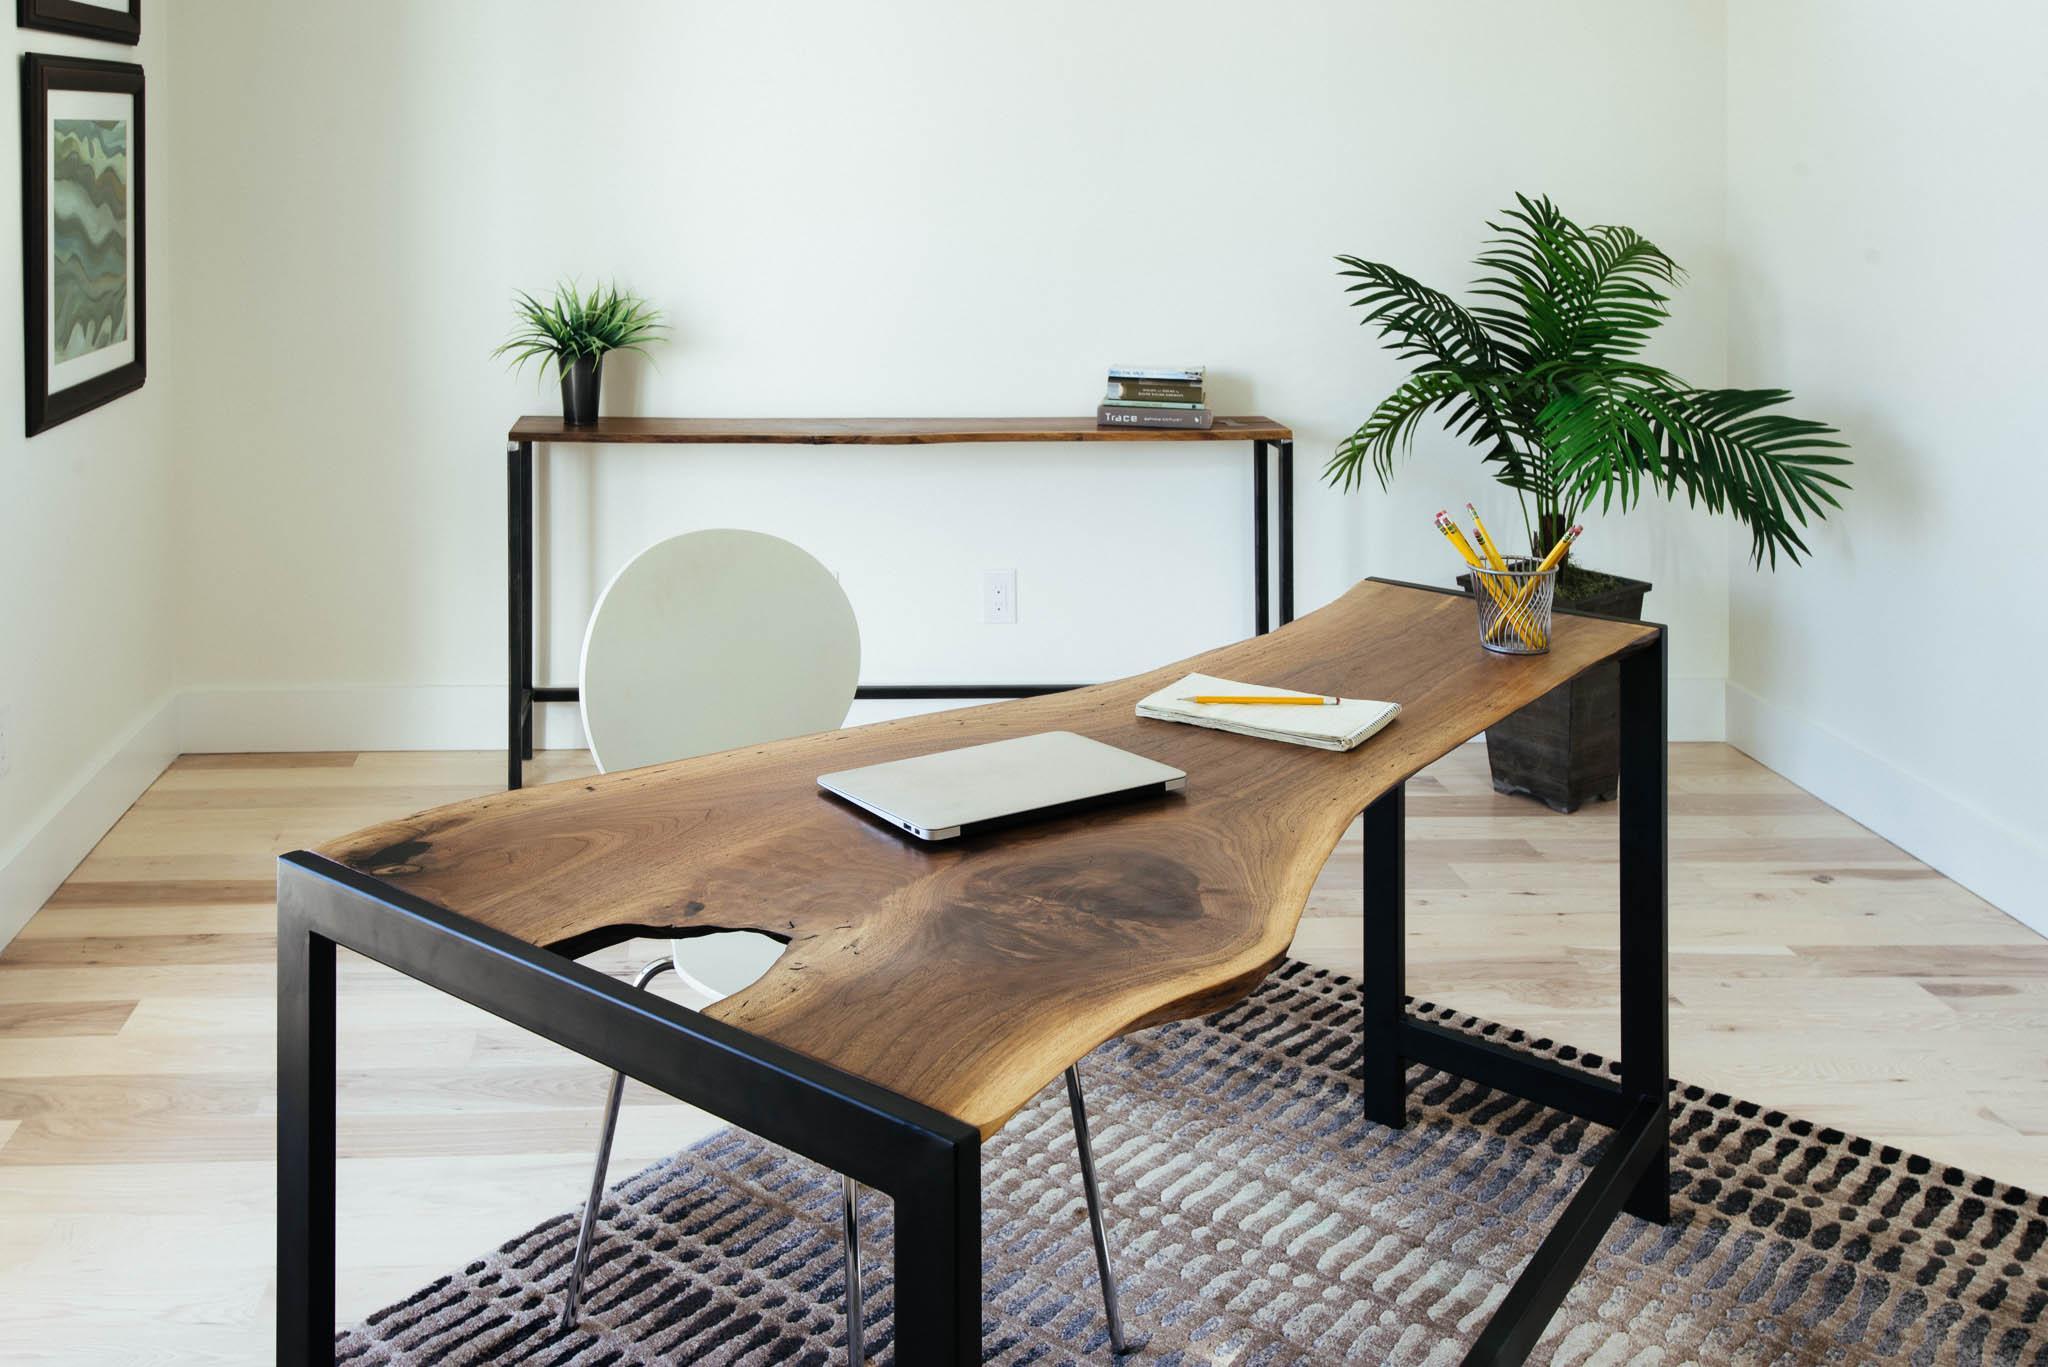 Walnut desk and sofa table